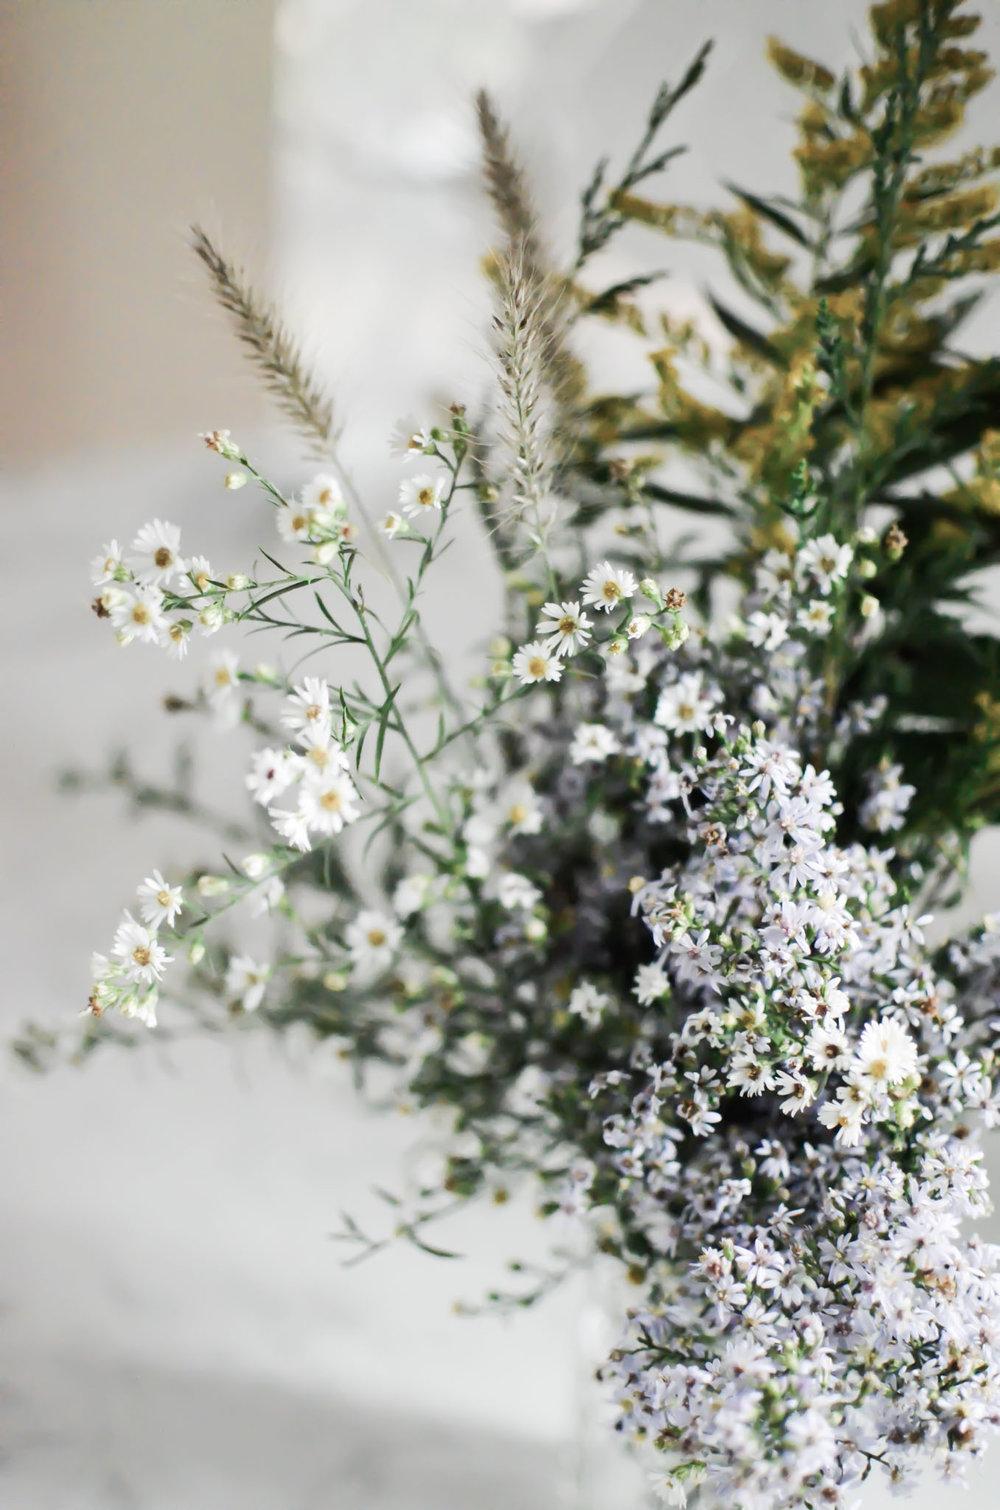 Wendling_Boyd__Wild_Flowers-5.jpg